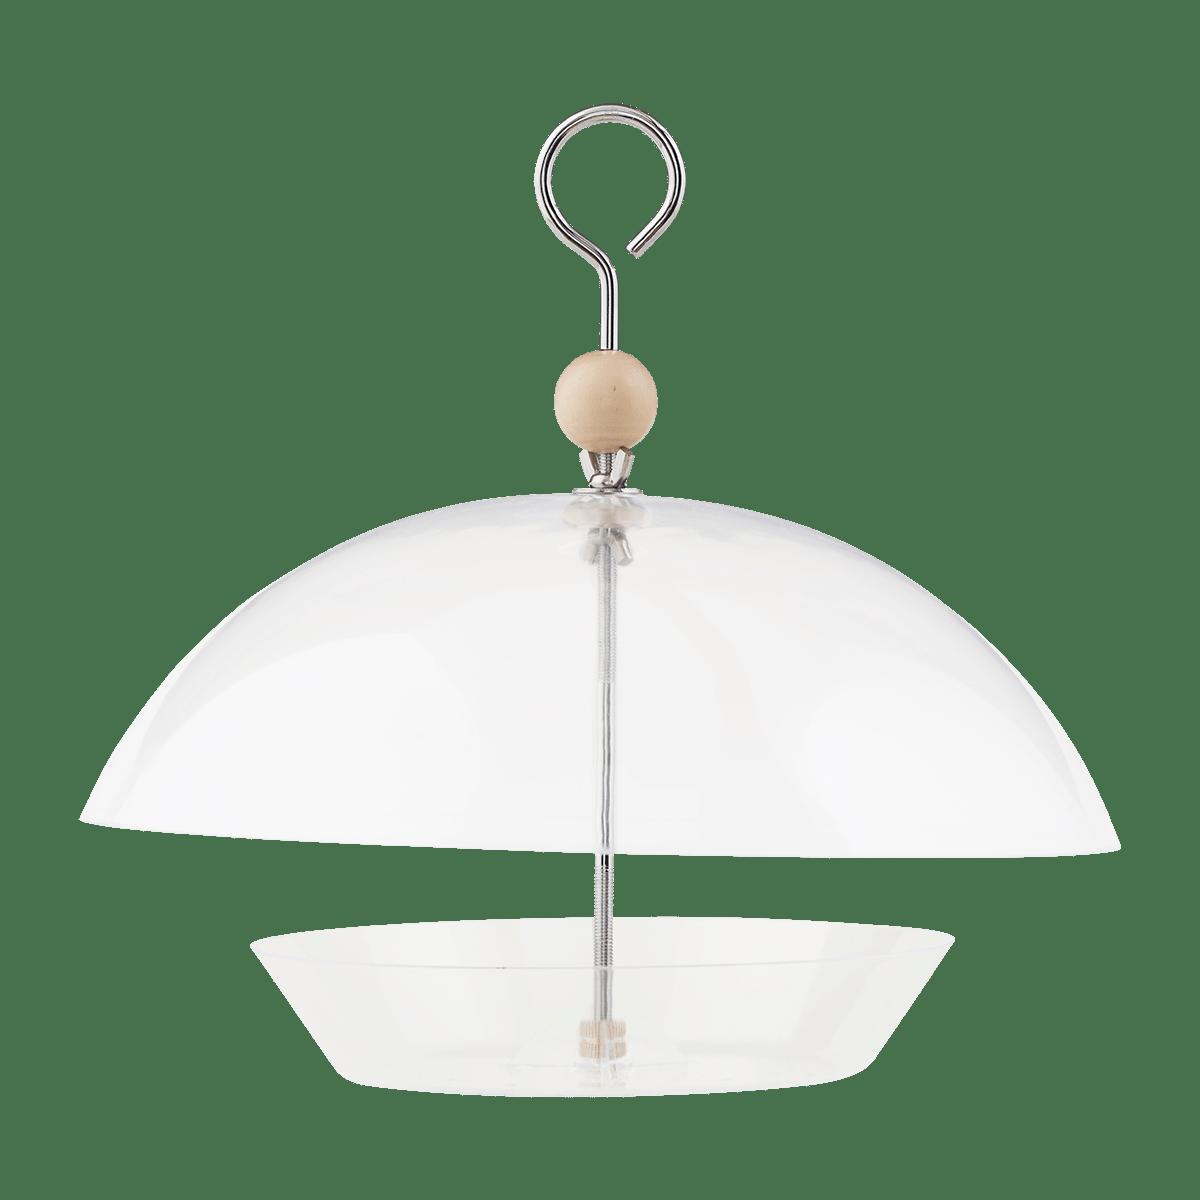 Sada 2 ks − Ptačí krmítko Dome